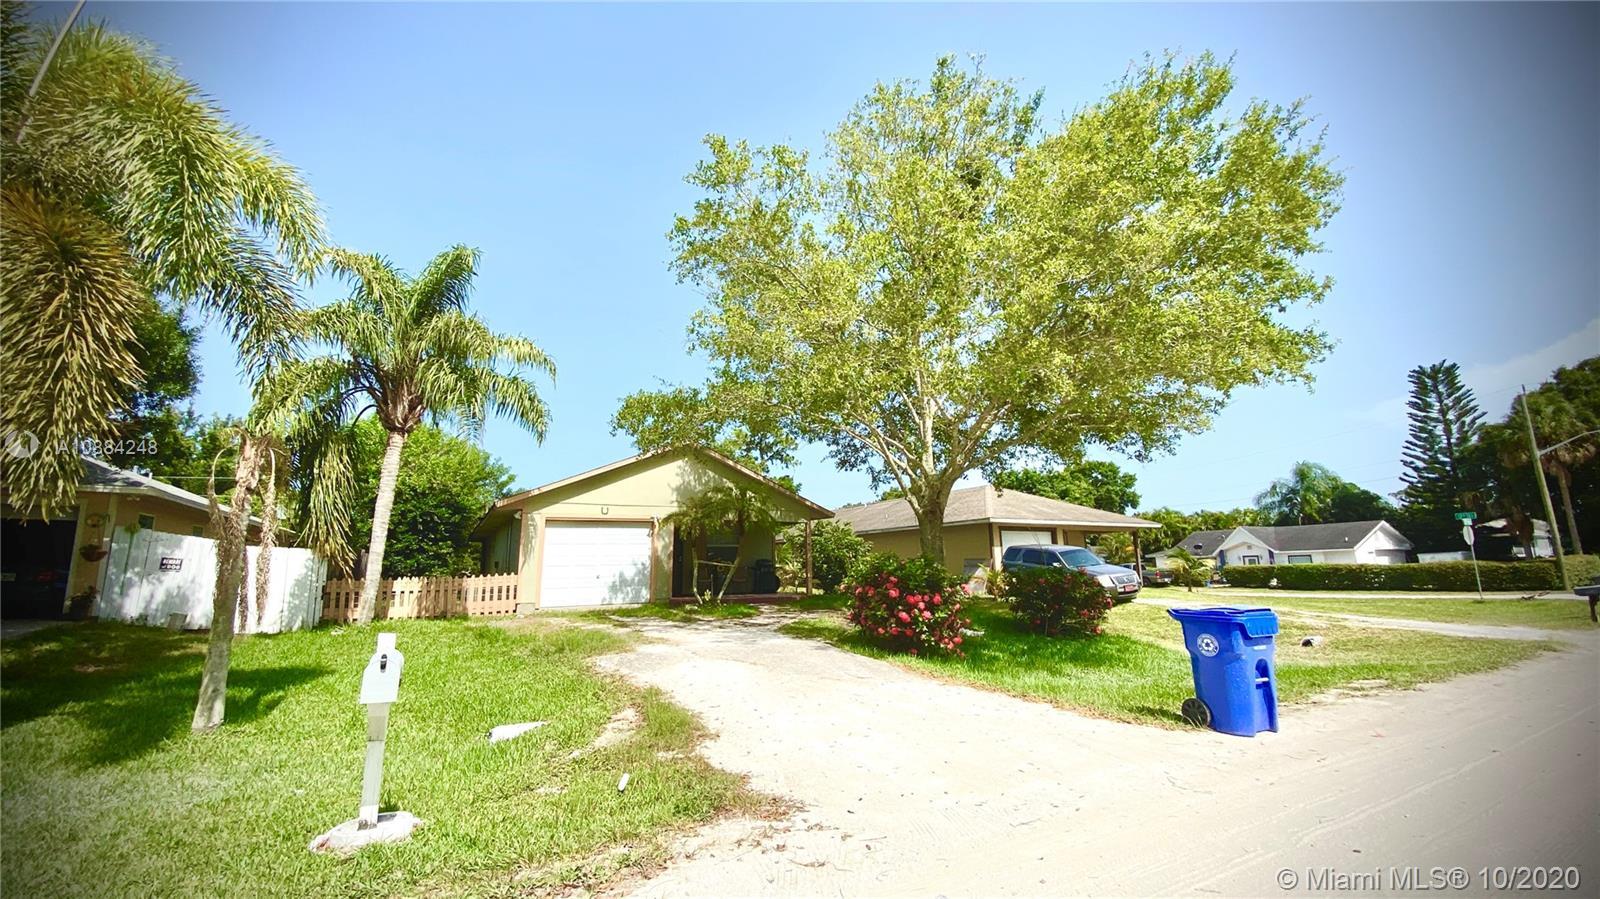 1186 19th Ave SW, Vero Beach, FL 32962